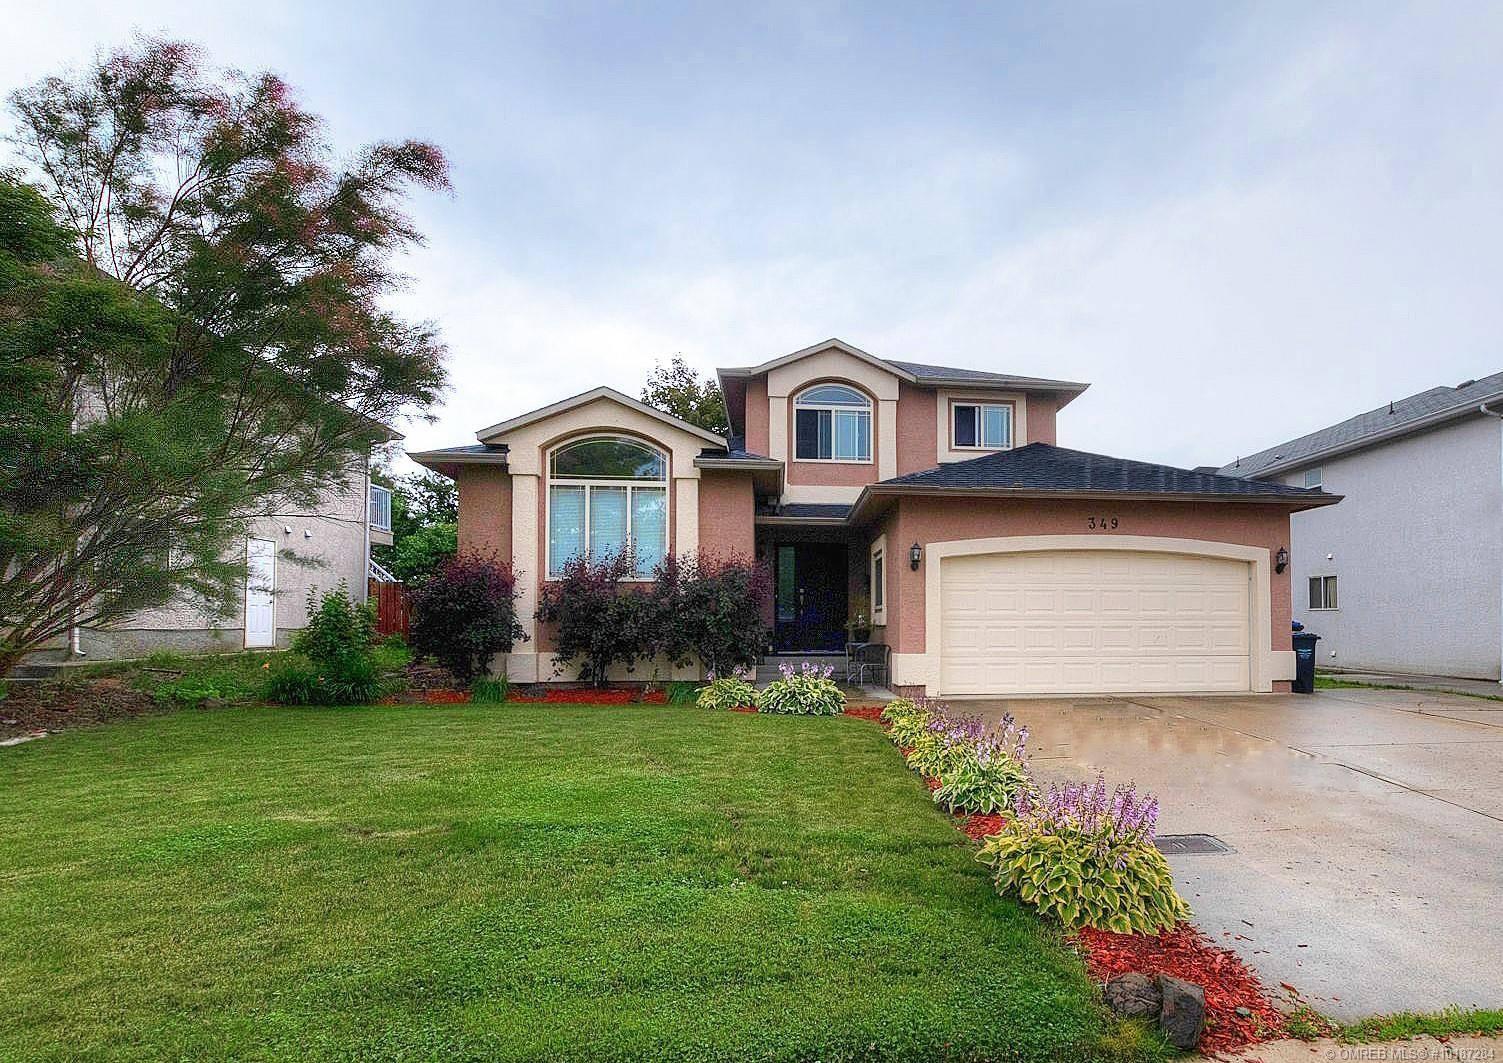 House for sale at 349 Sumac Rd East Kelowna British Columbia - MLS: 10187284